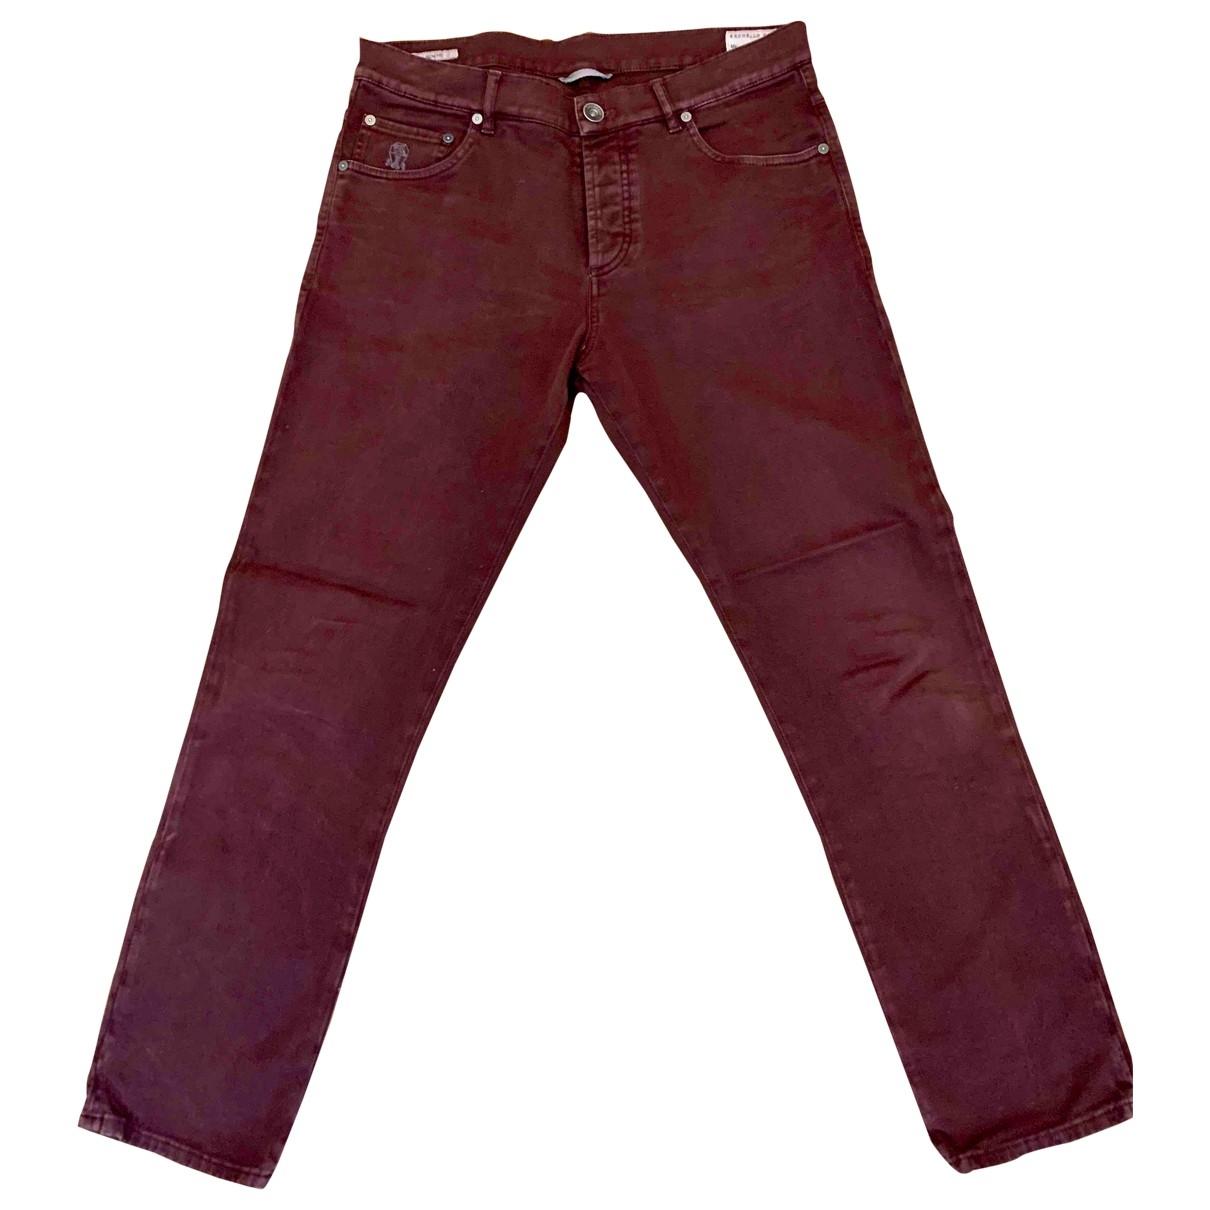 Brunello Cucinelli \N Burgundy Cotton Trousers for Men 48 IT